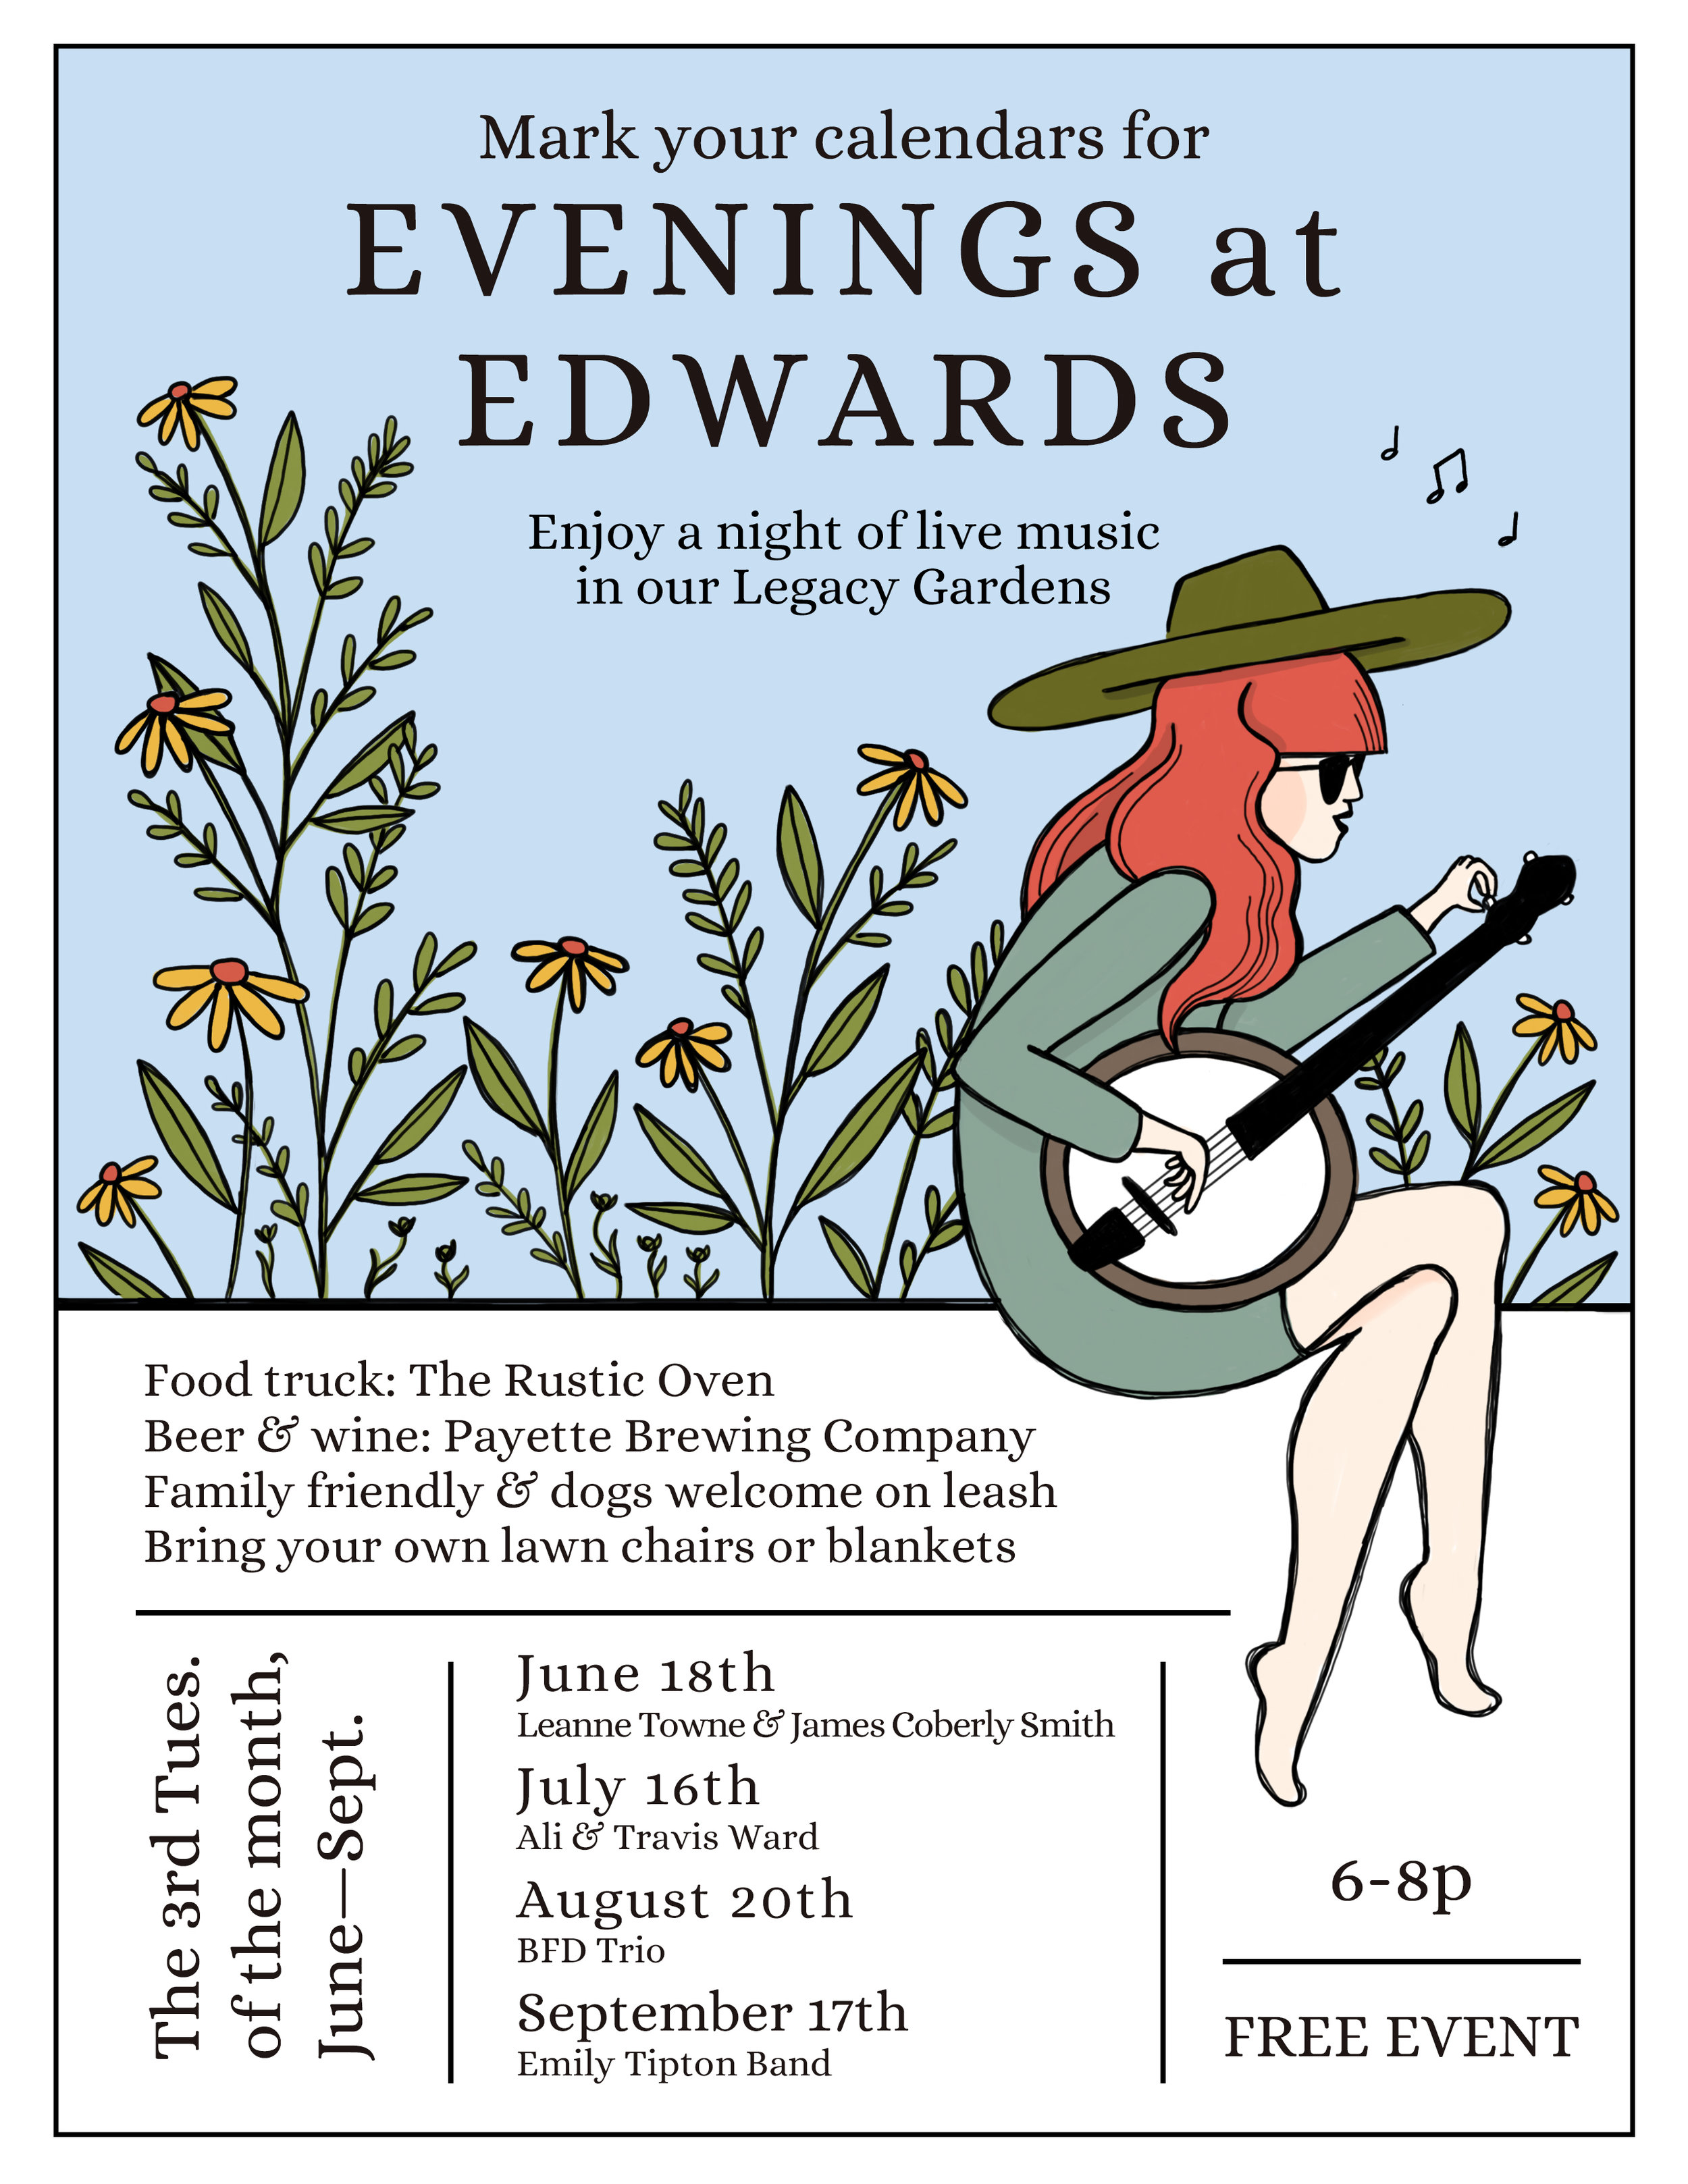 Evenings at Edwards 2019.jpg